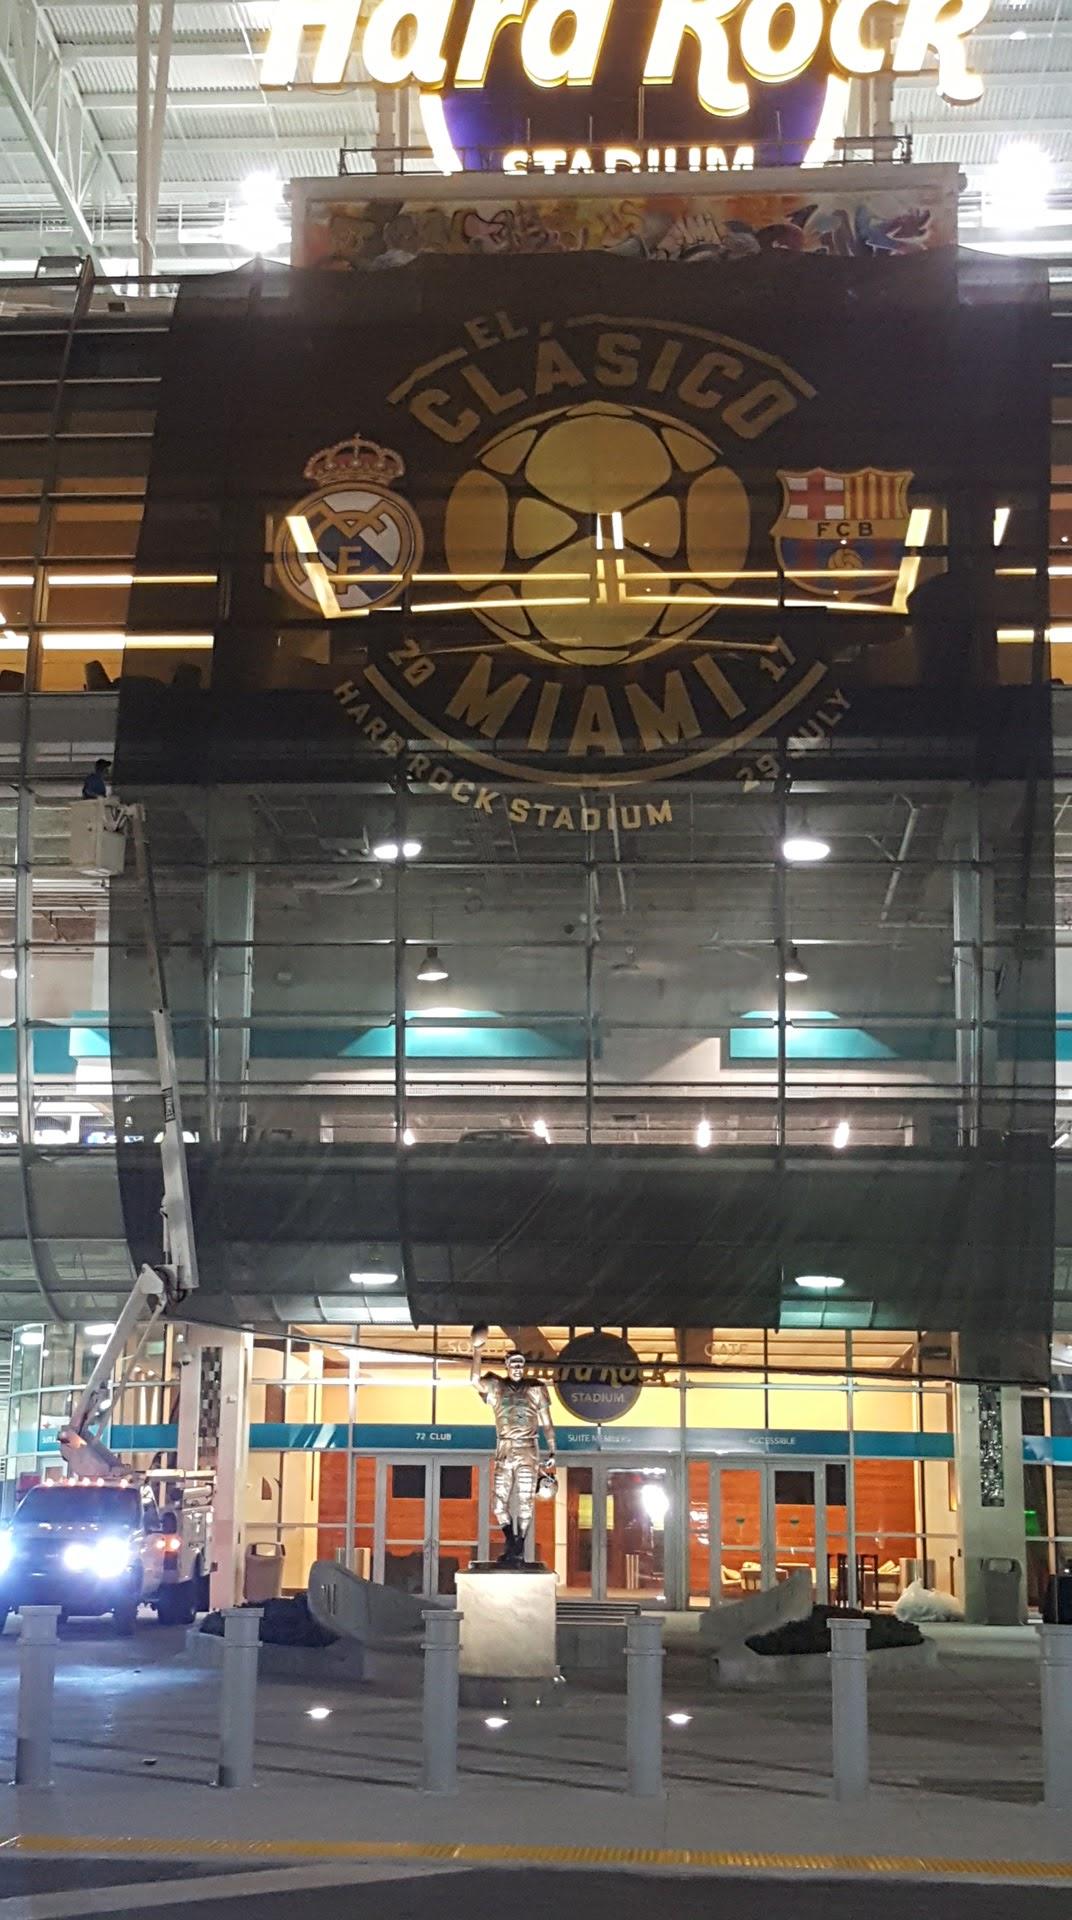 El Cl Sico Miami International Champions Cup At Hard Rock Stadium Miami Gardens Fl Master